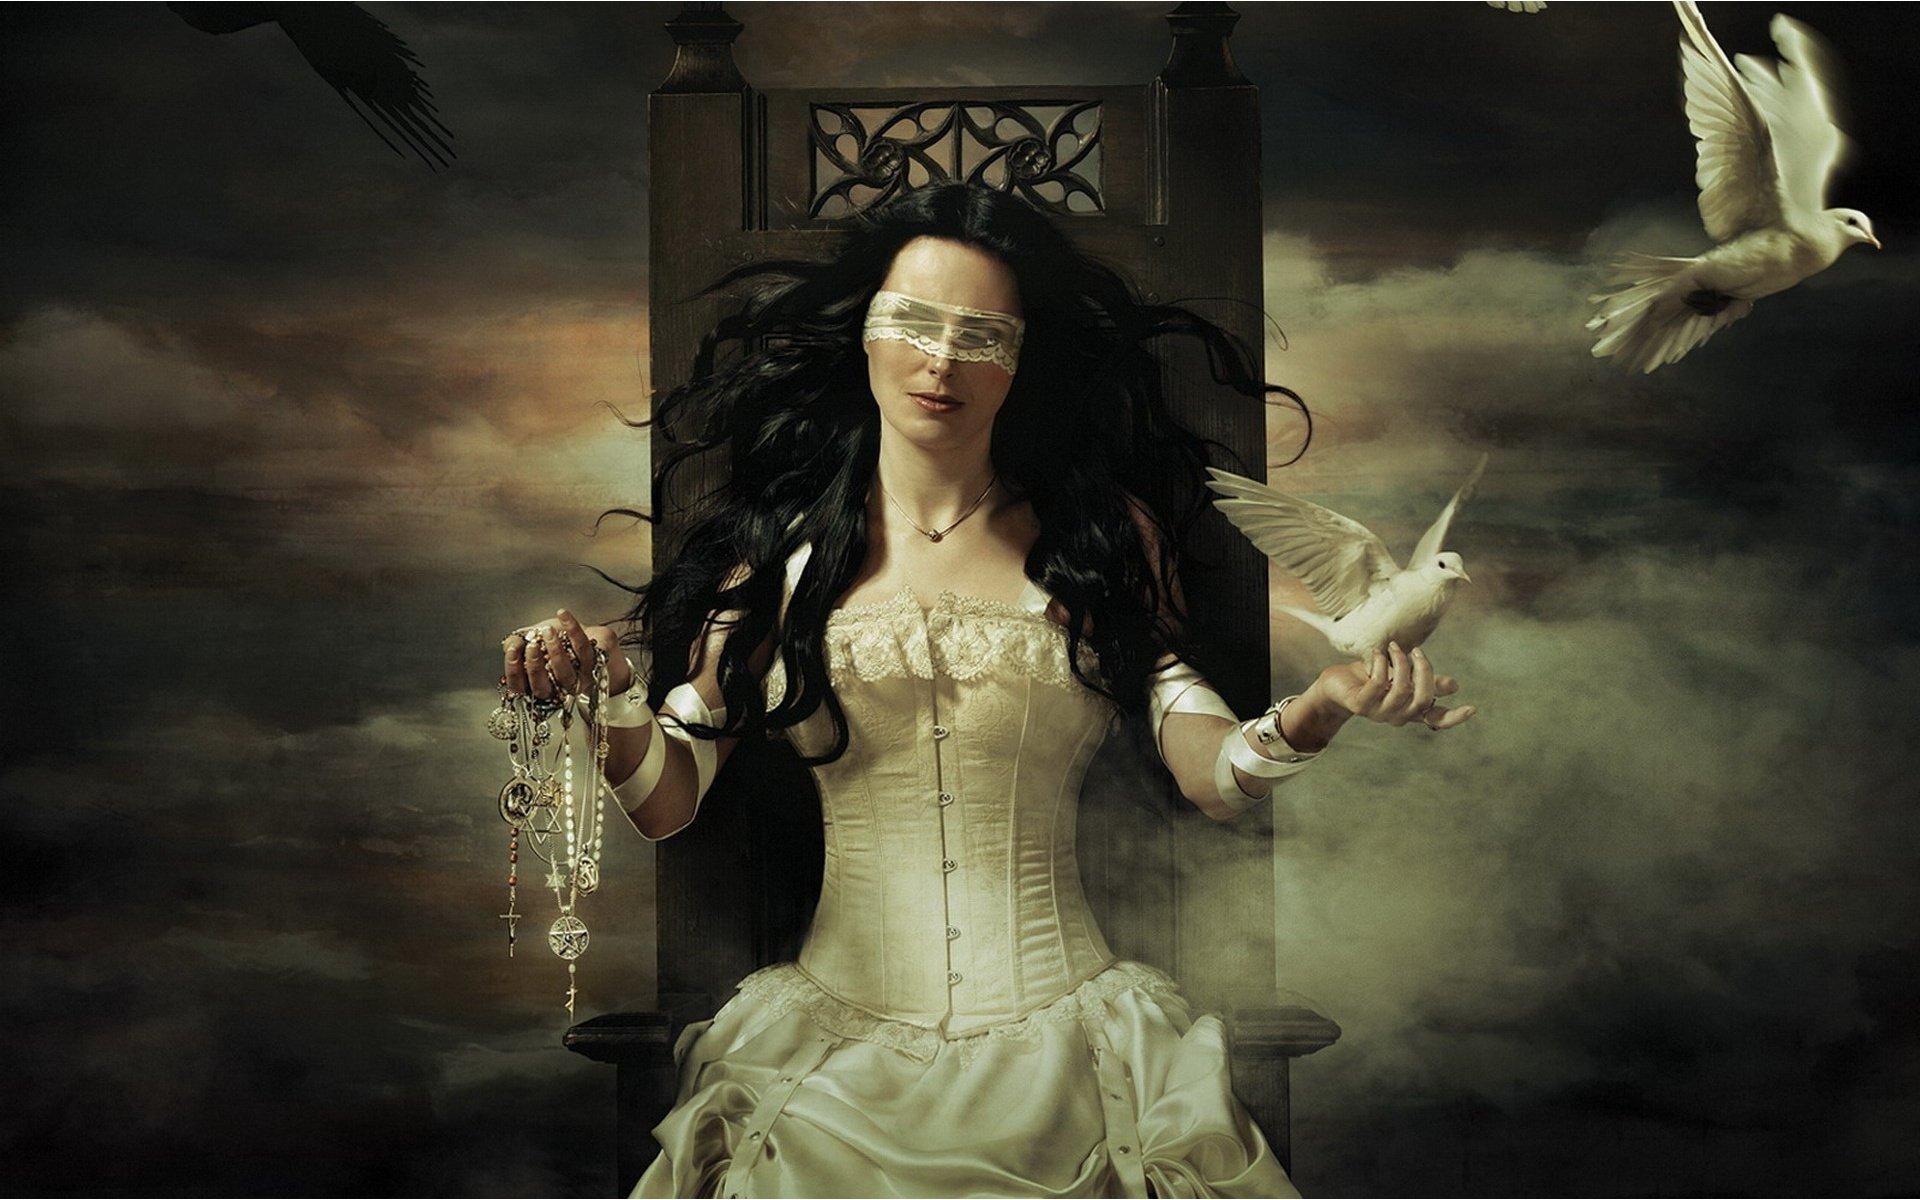 13 Sharon Den Adel Hd Wallpapers Background Images